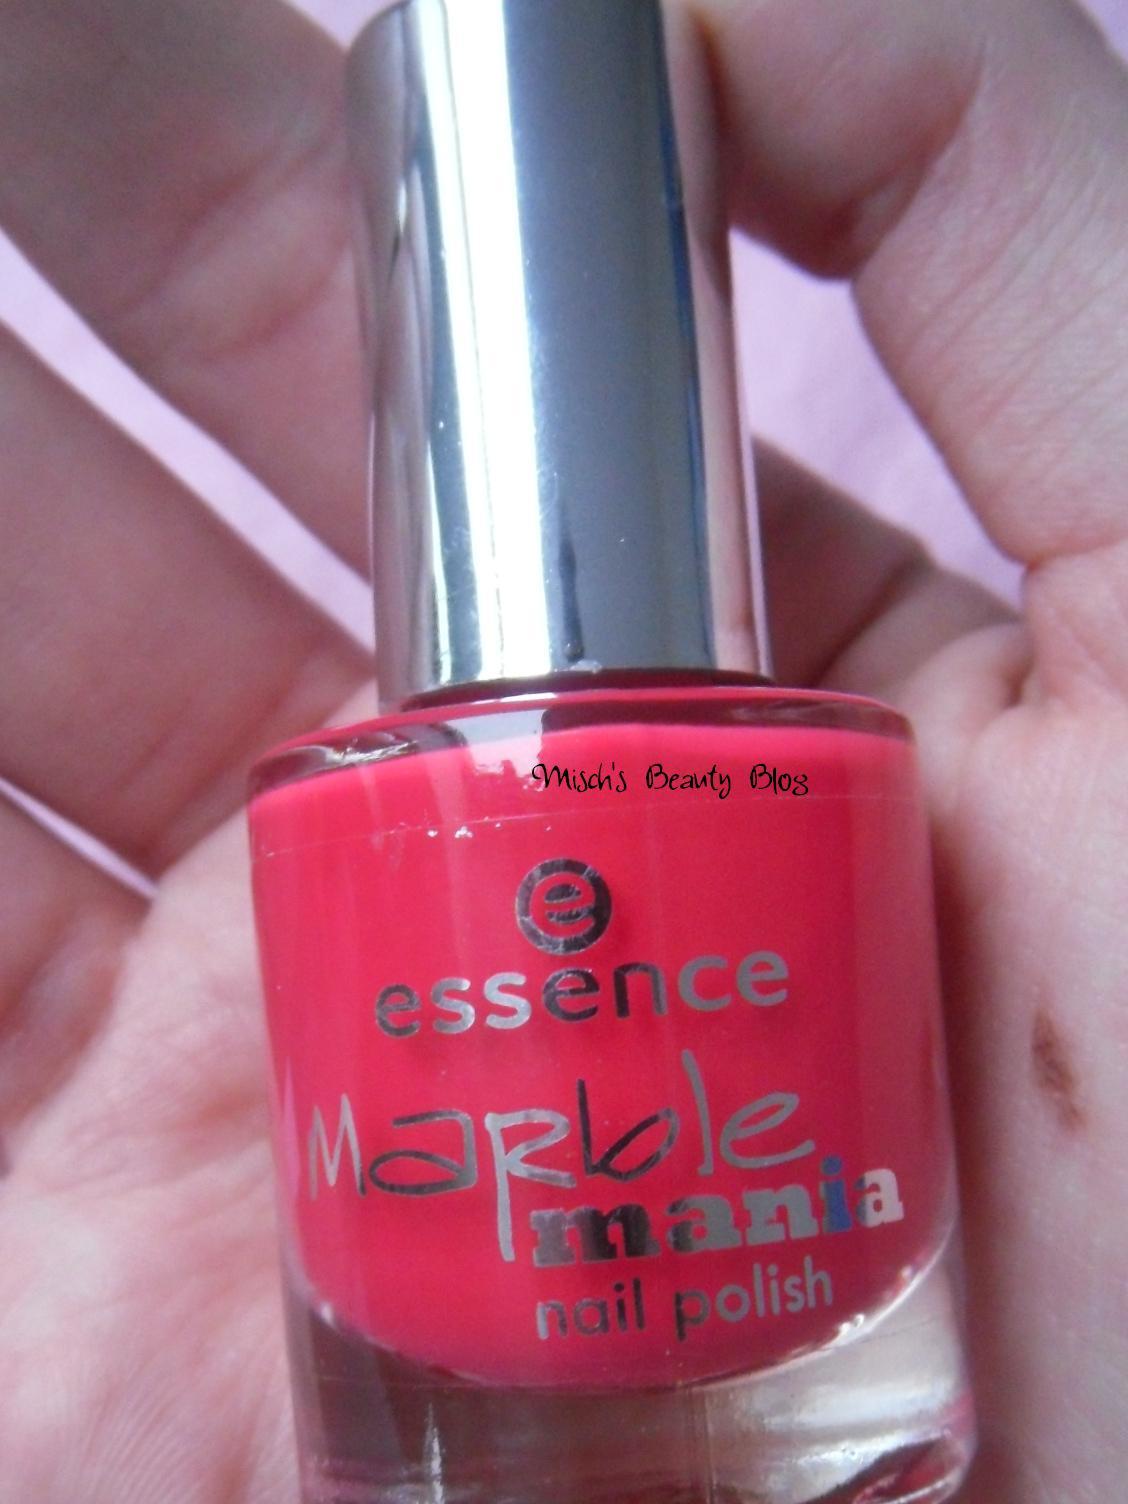 Misch S Beauty Blog Notd September 29th Fall Leaf Nail Art: Misch's Beauty Blog: February 2012